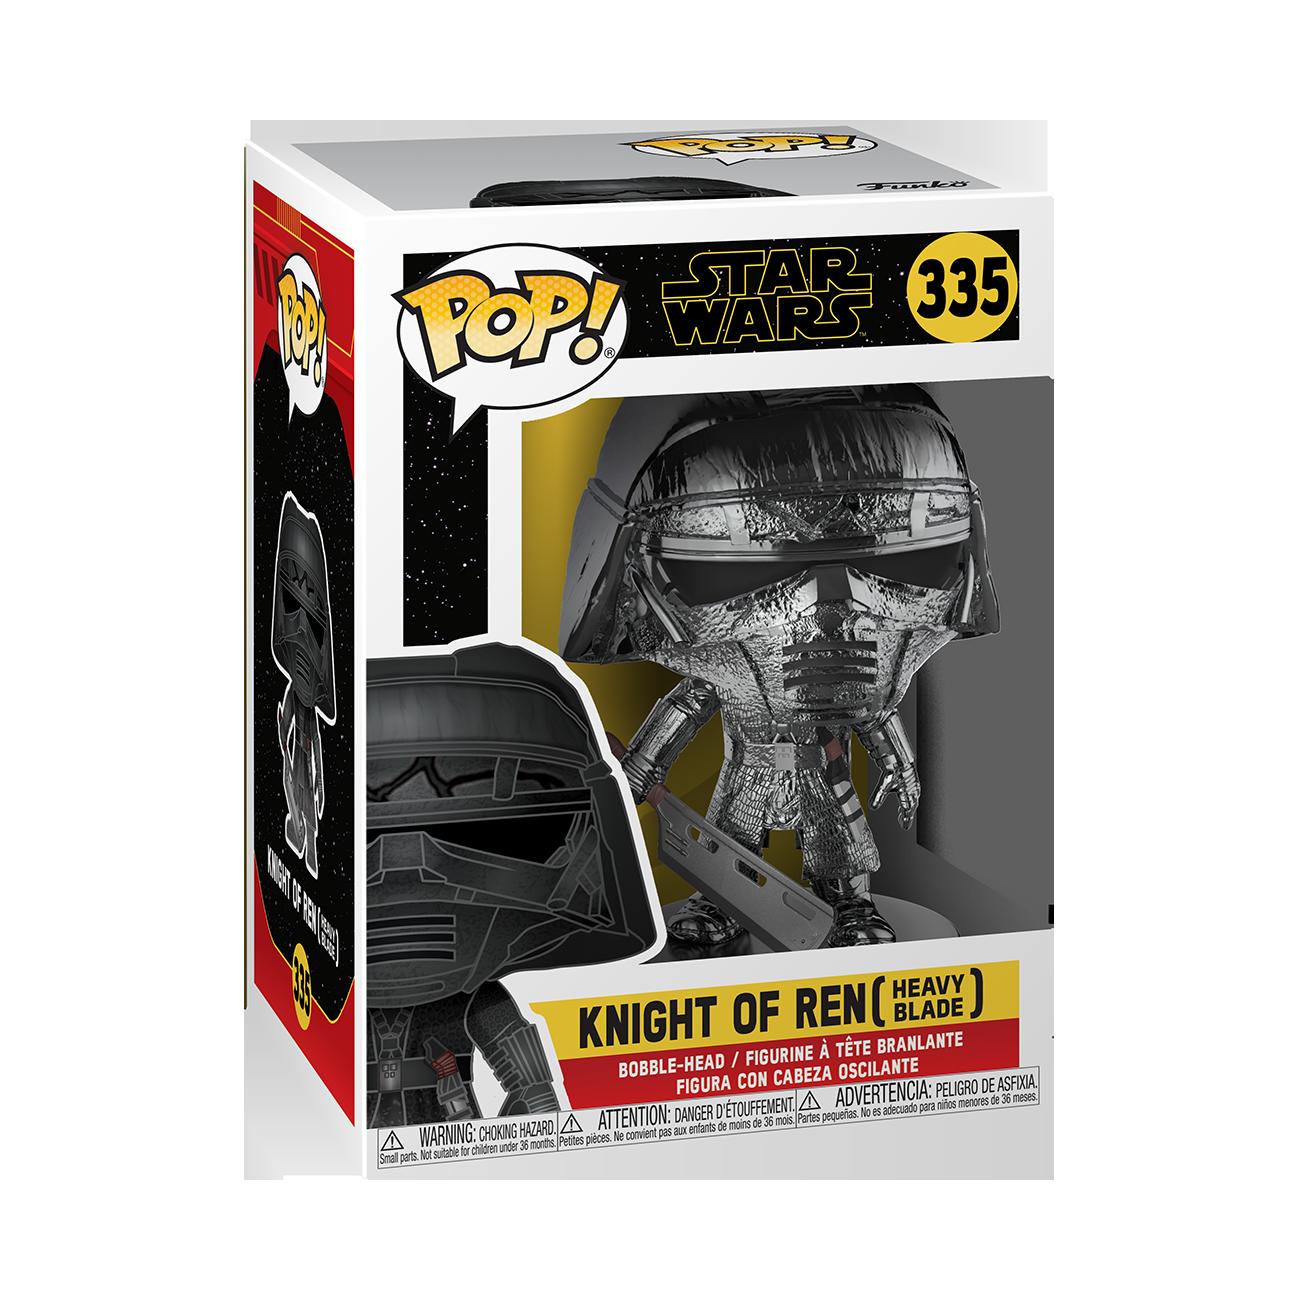 TROS Knight Of Ren (Blade) Hematite Chrome Bobble Head Toy 1